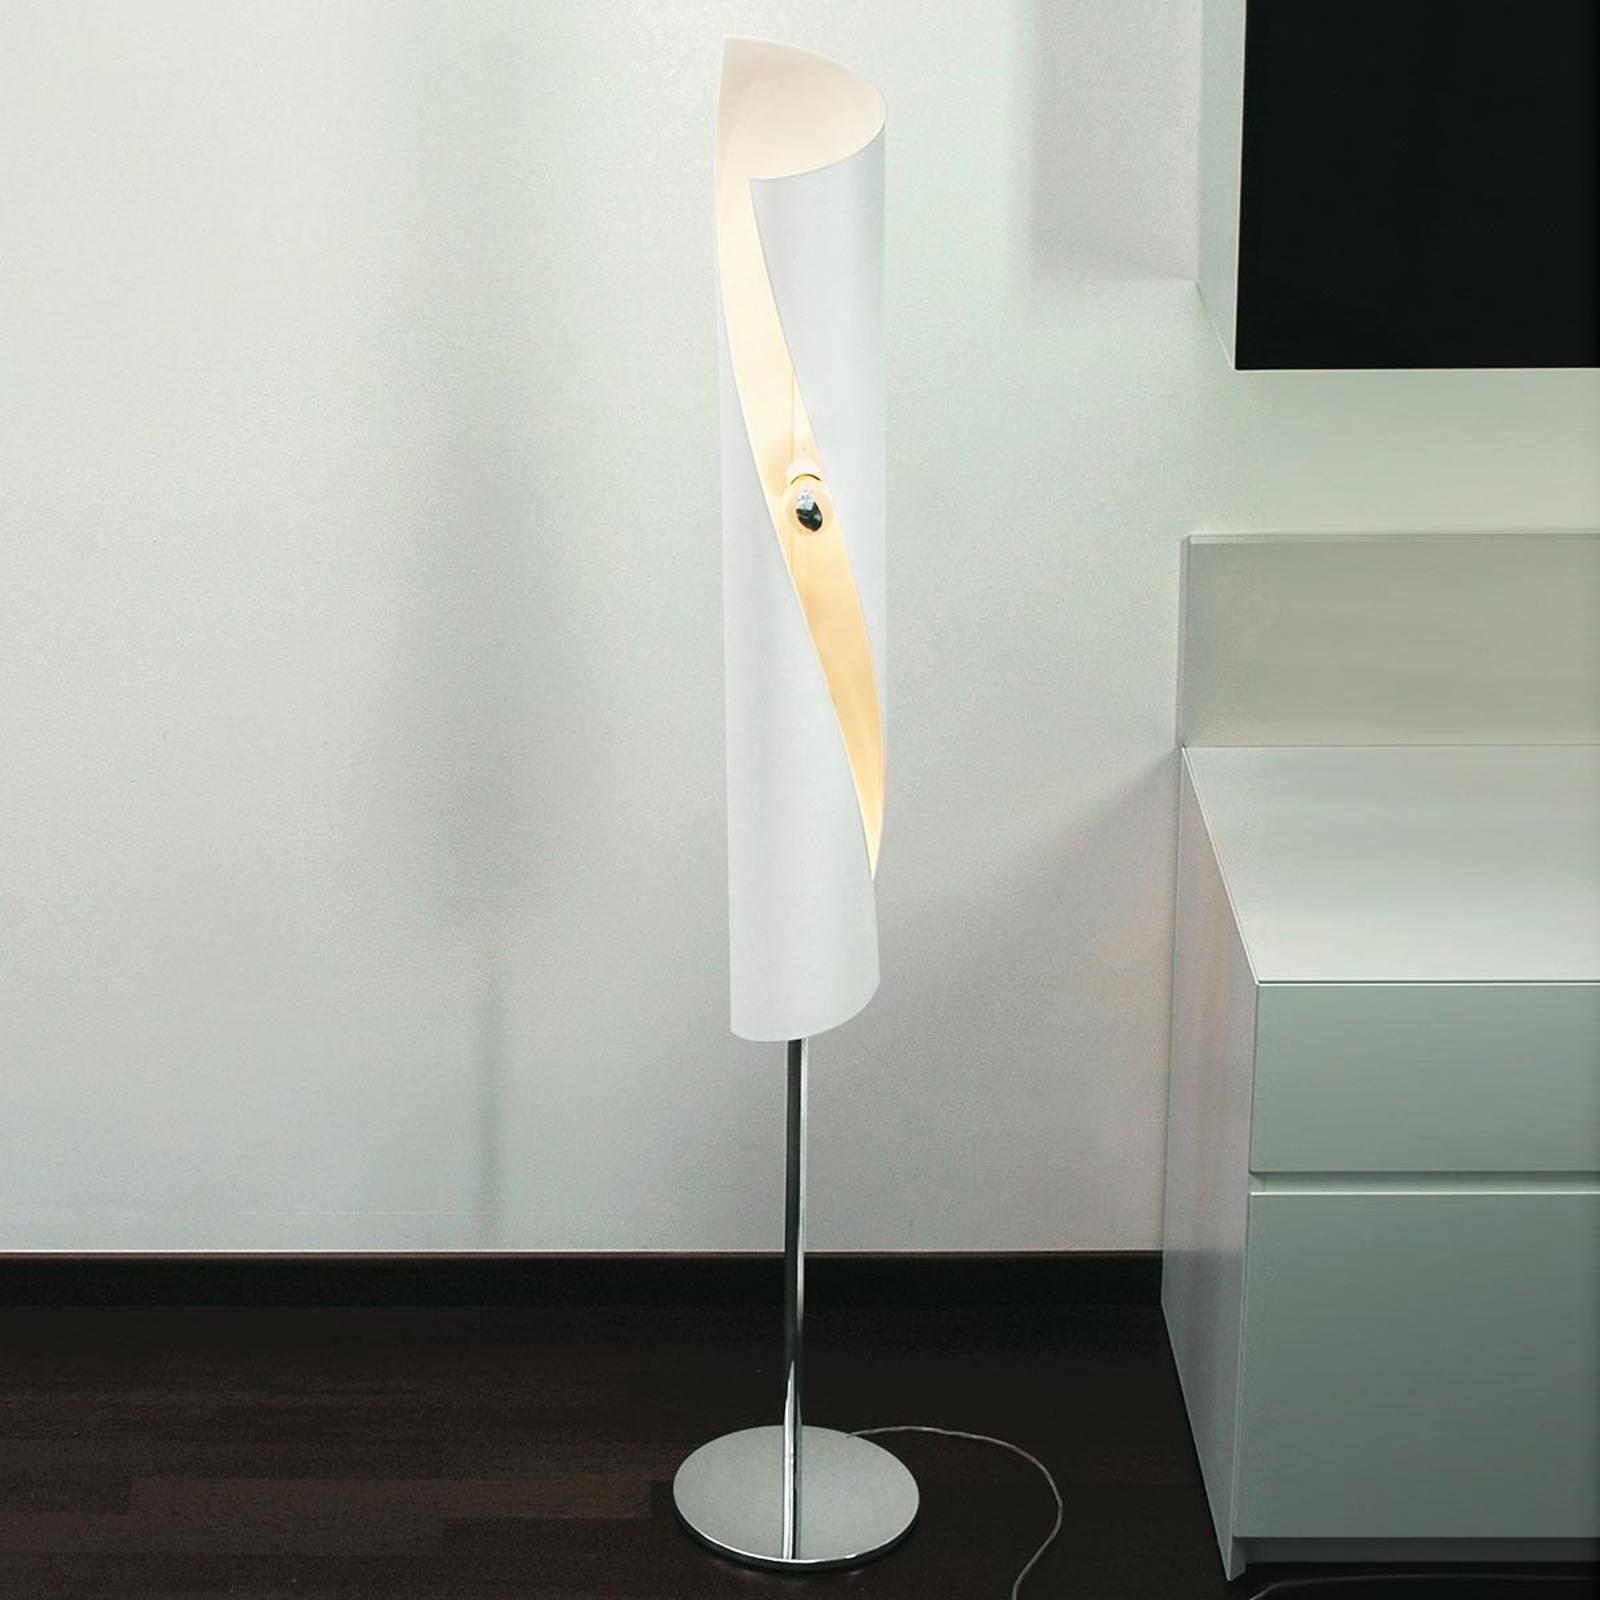 Knikerboker Hué - lampadaire de designer blanc